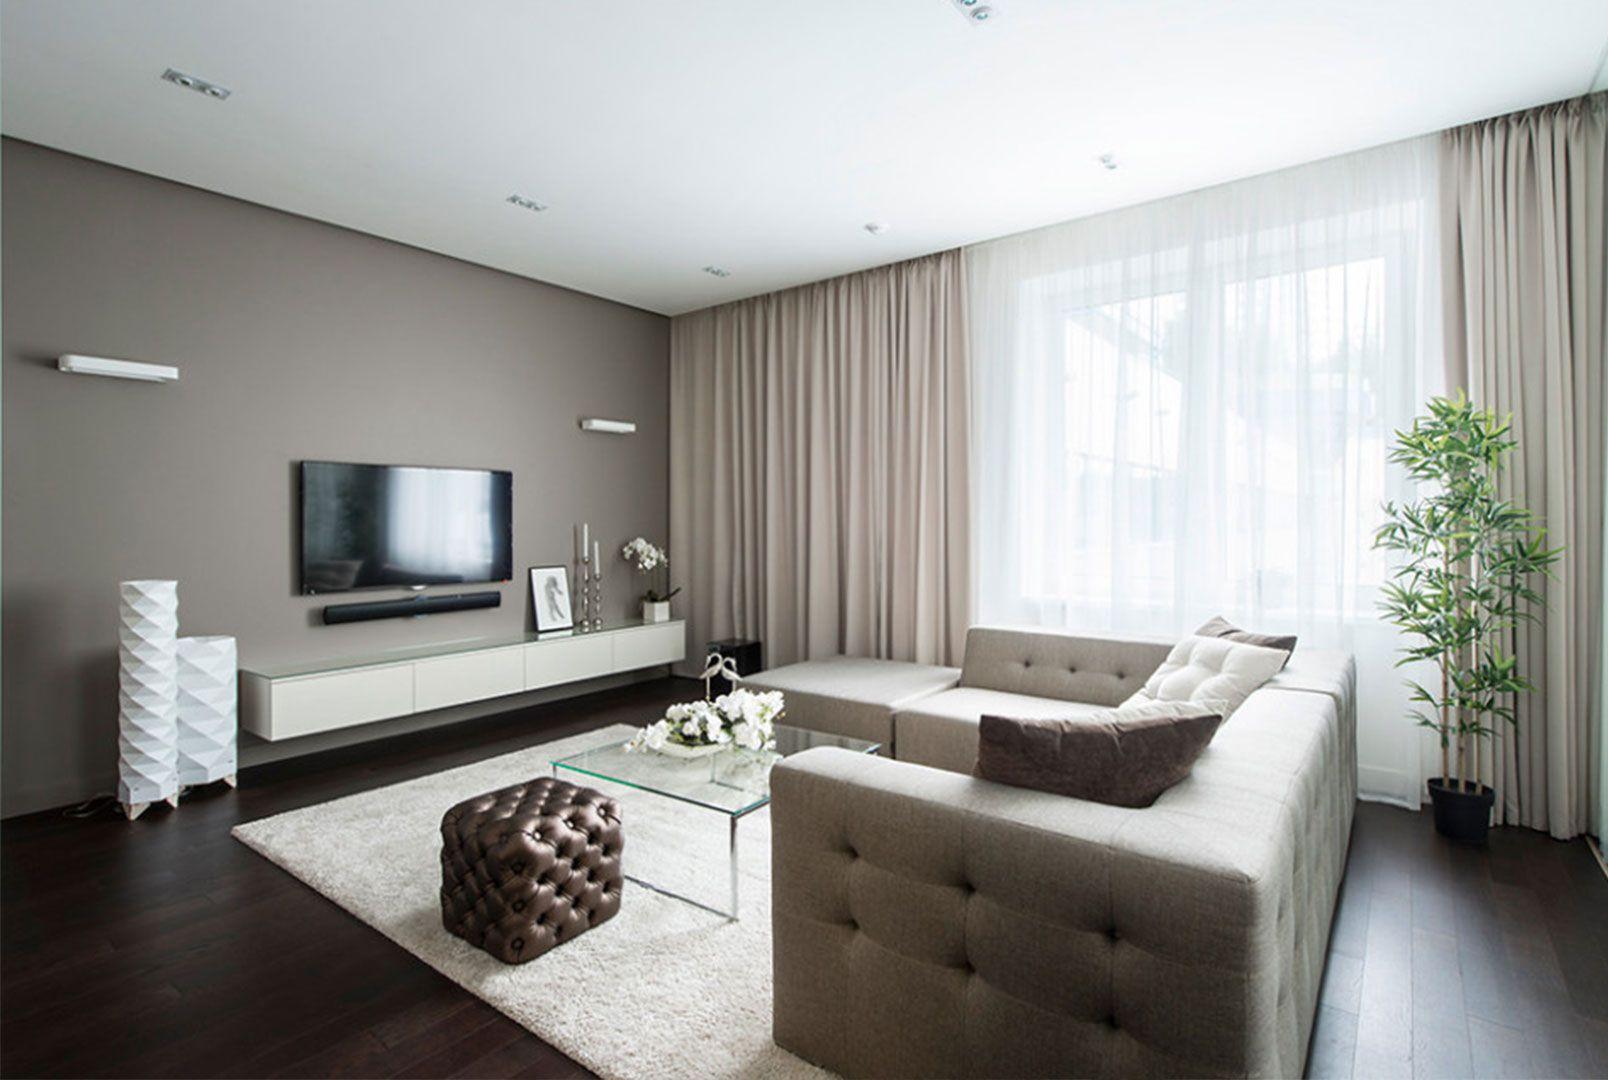 Home, inspo, modern, interior, design, fashion, home decor | Home ...